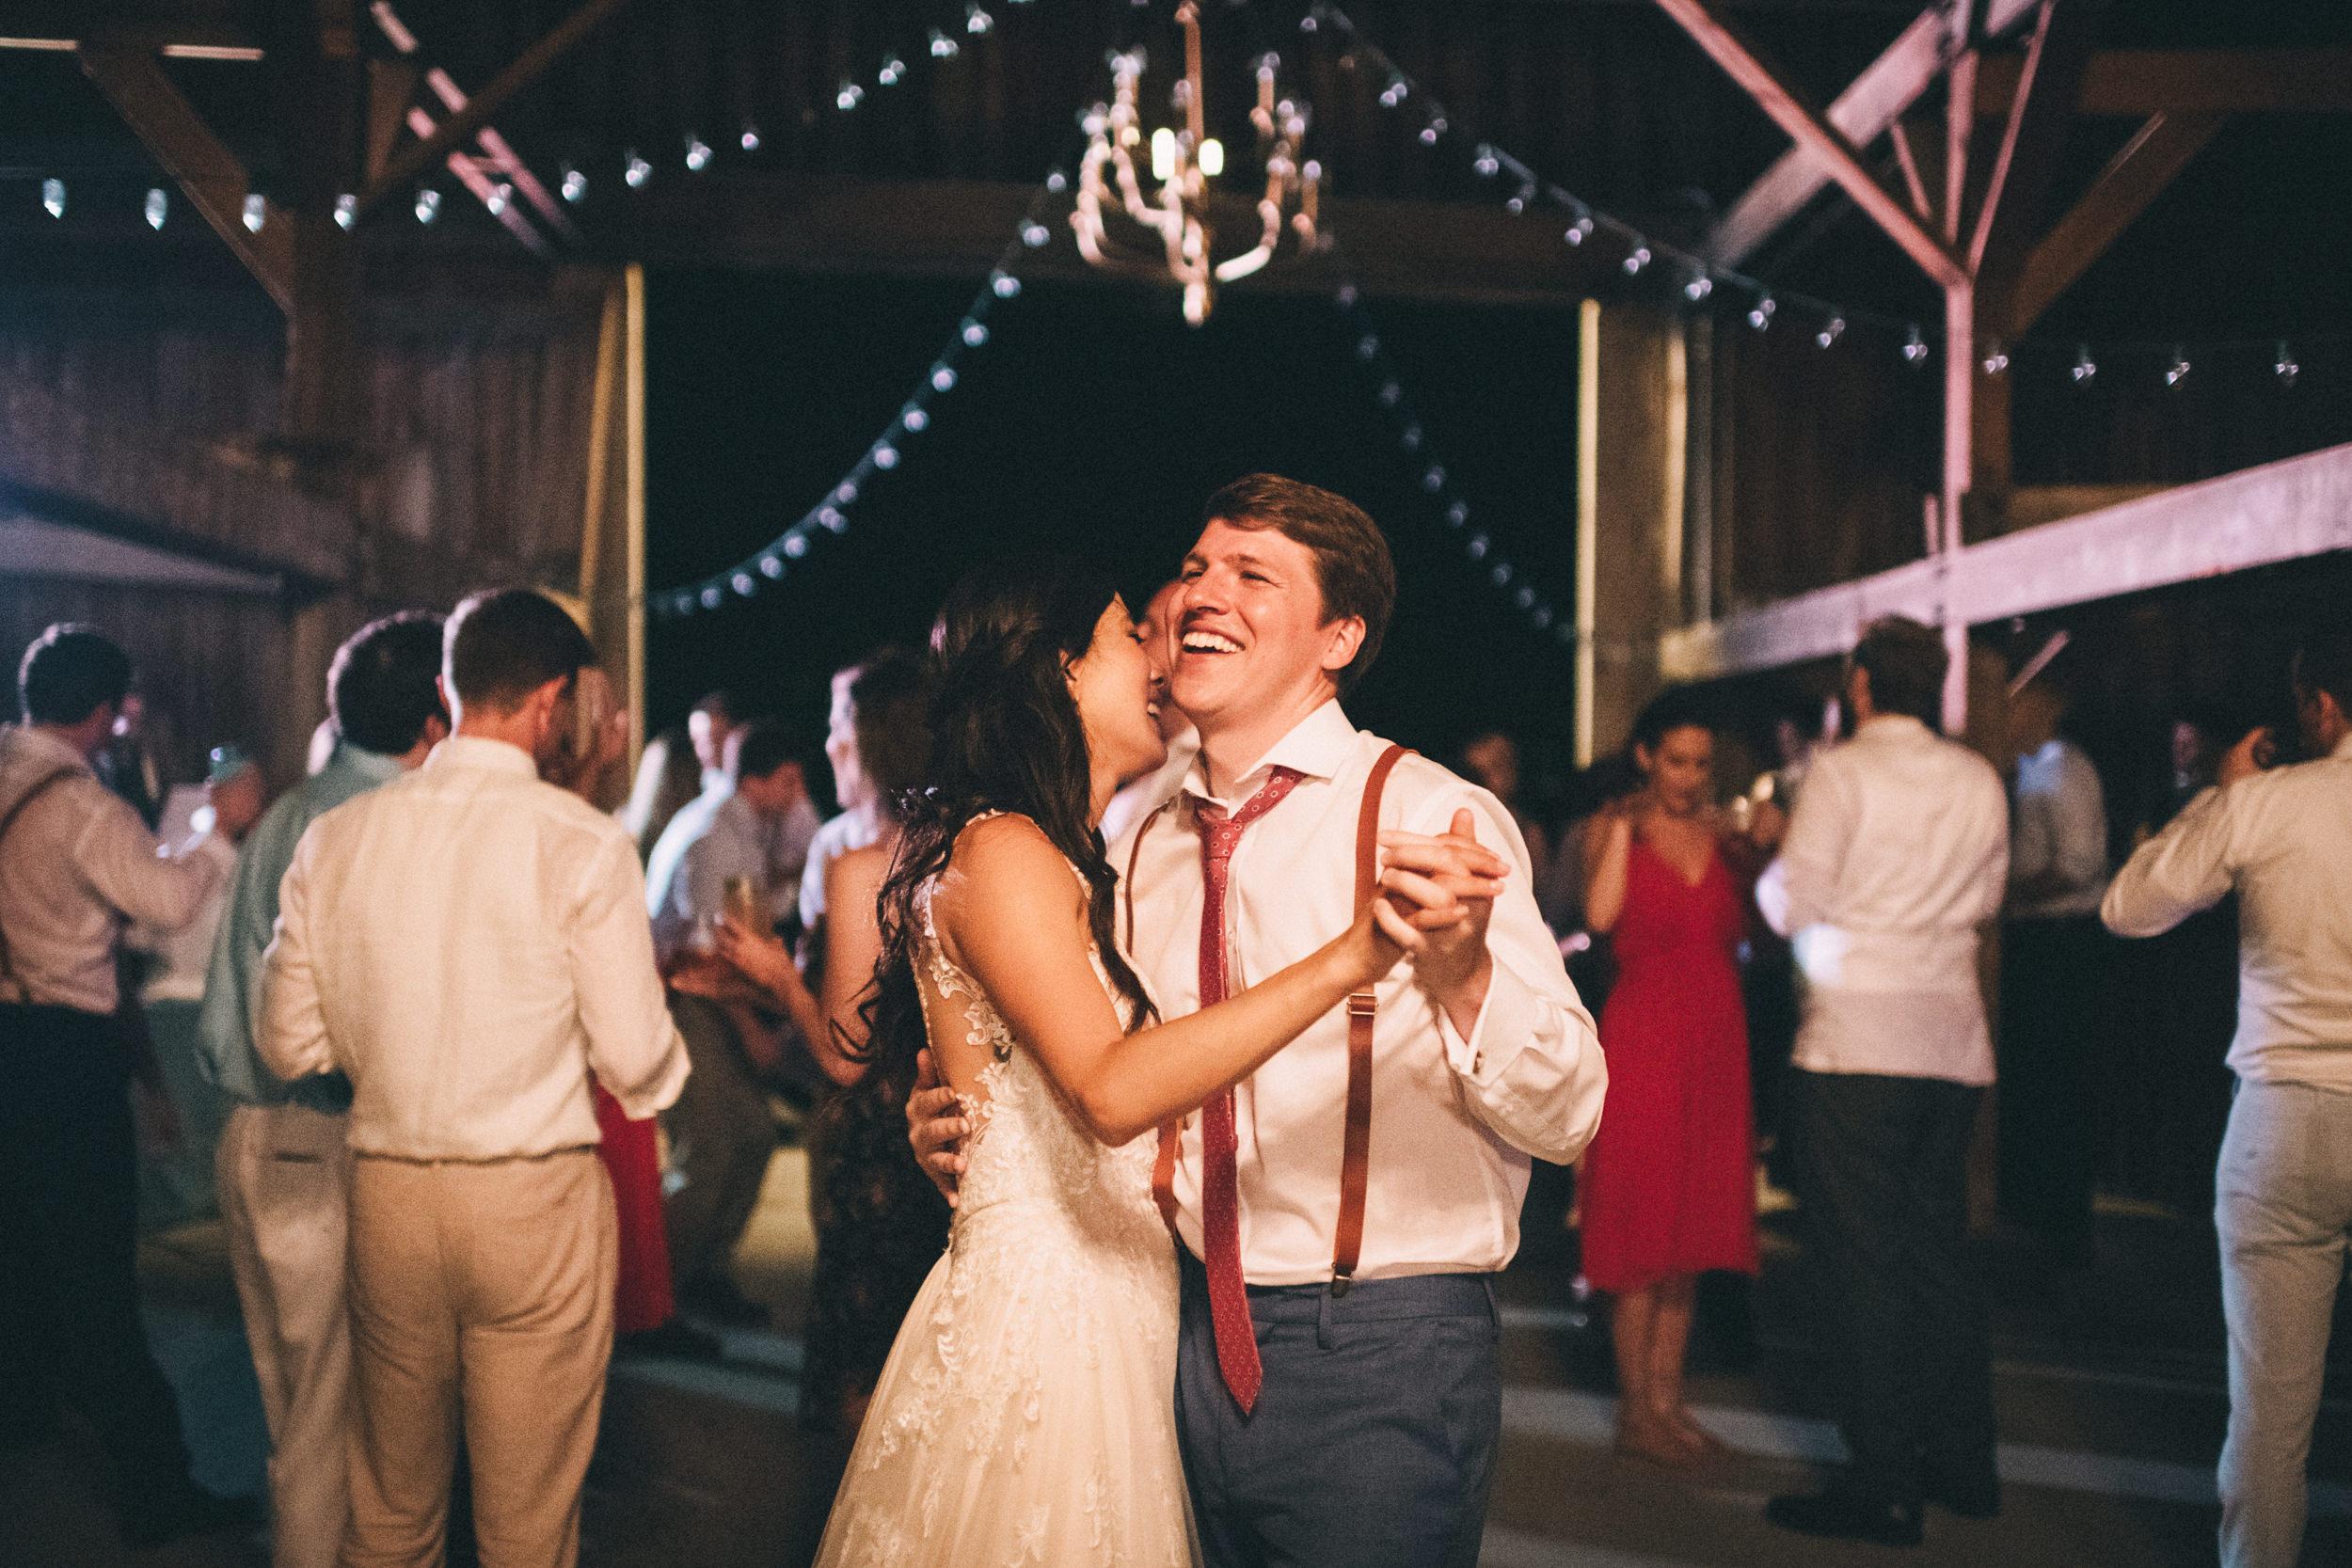 Louisville-Kentucky-Wedding-and-Elopement-Photographer-Sarah-Katherine-Davis-Photography-Summer-Jewel-Toned-Wedding-Chineese-Tea-Ceremony-Warrenwood-Manor-Danville-1105.jpg